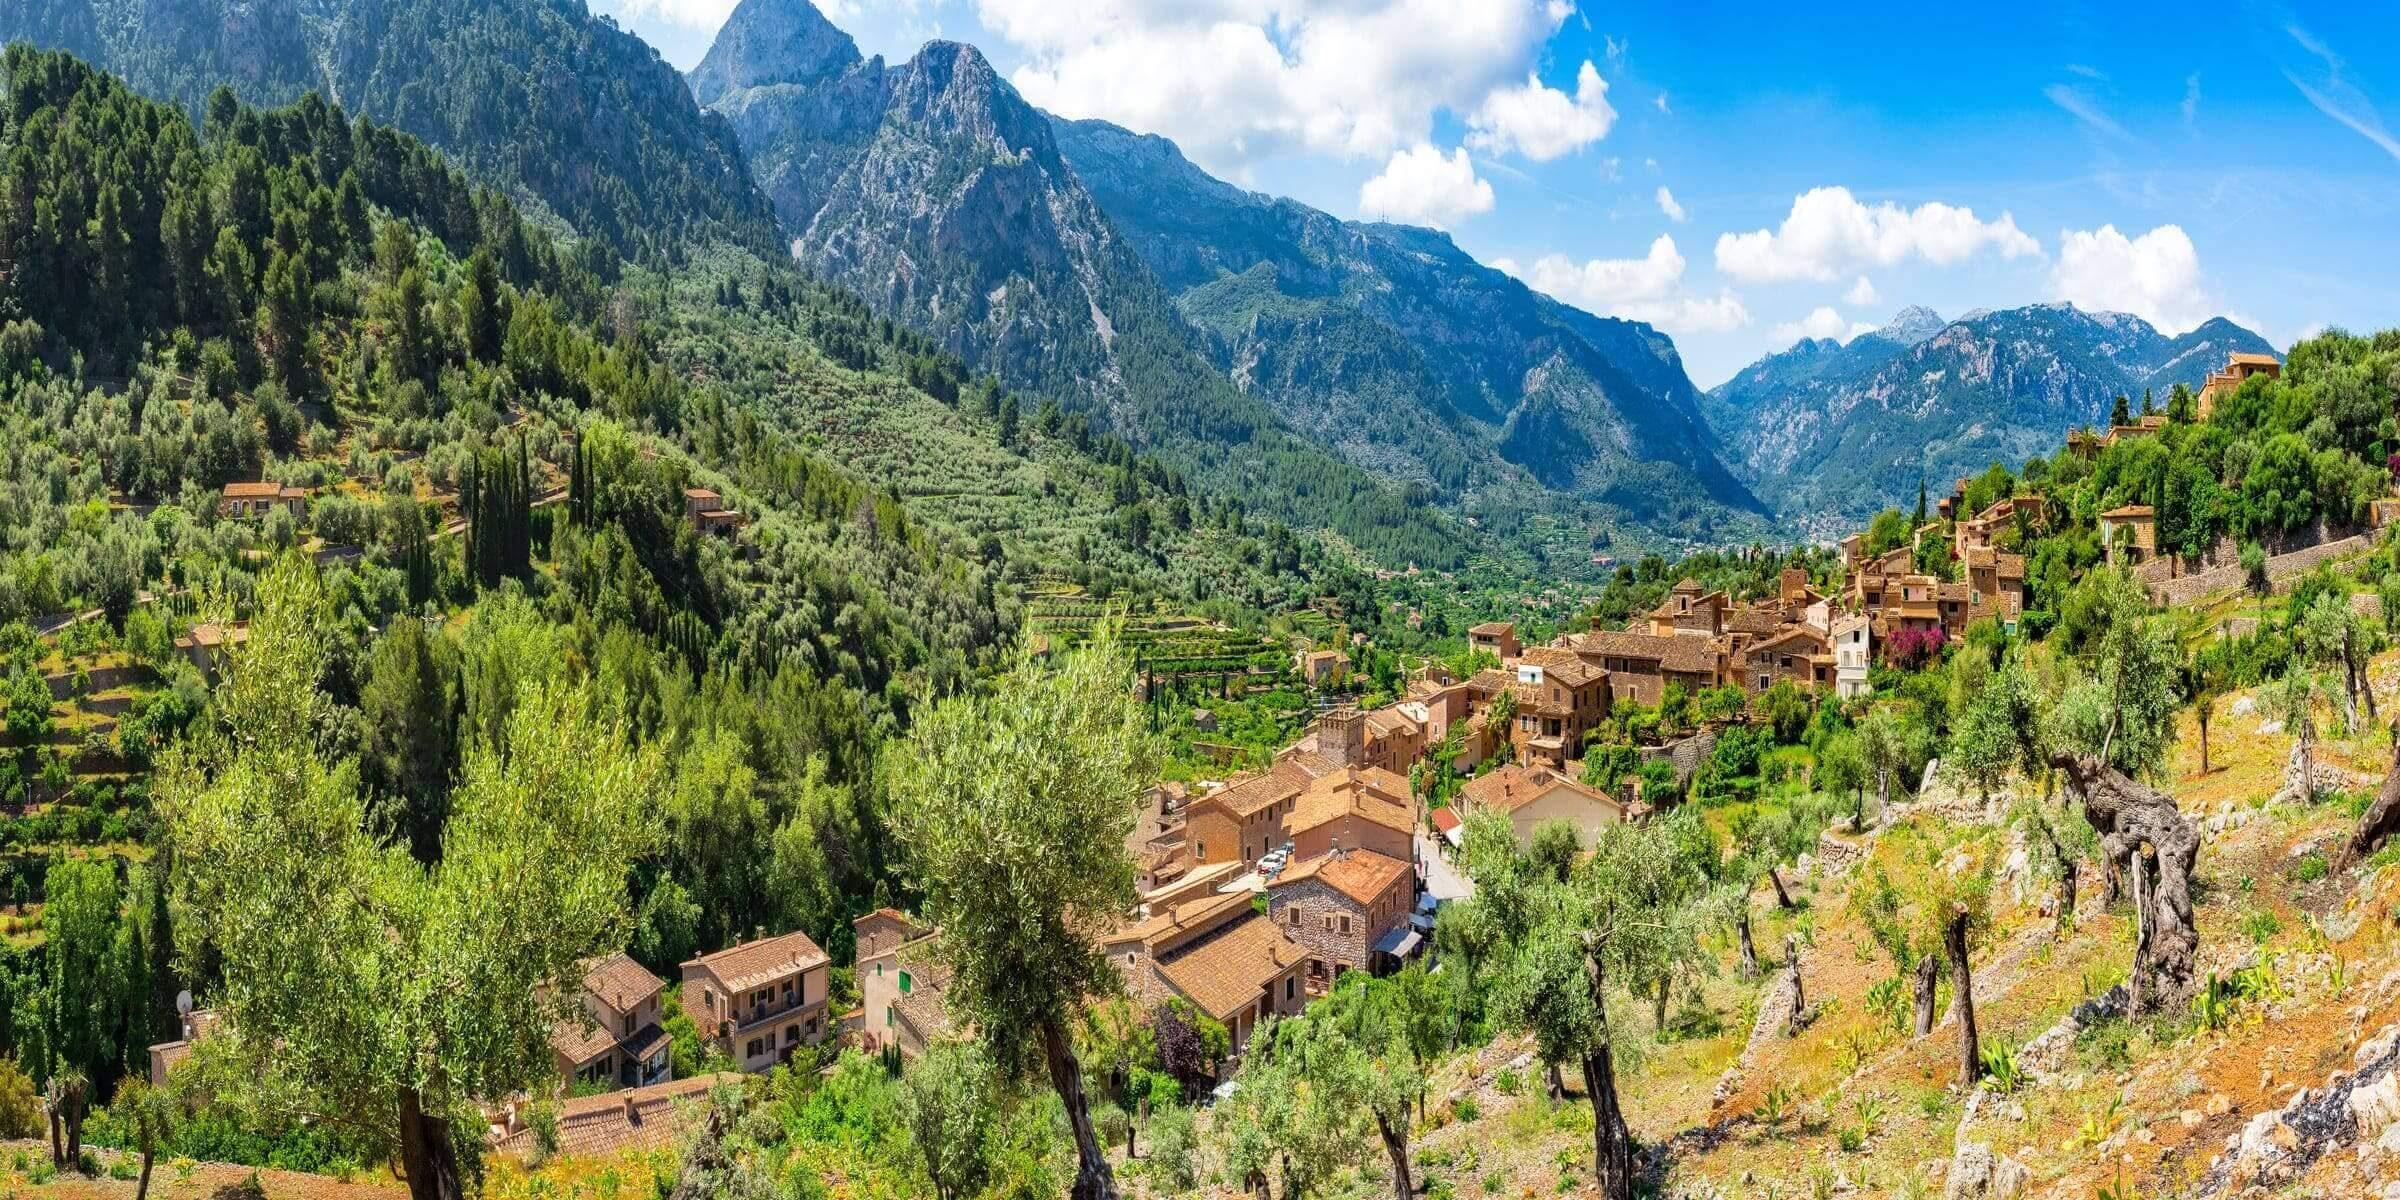 Singlereisen nach Mallorca - Dorf im Landesinneren